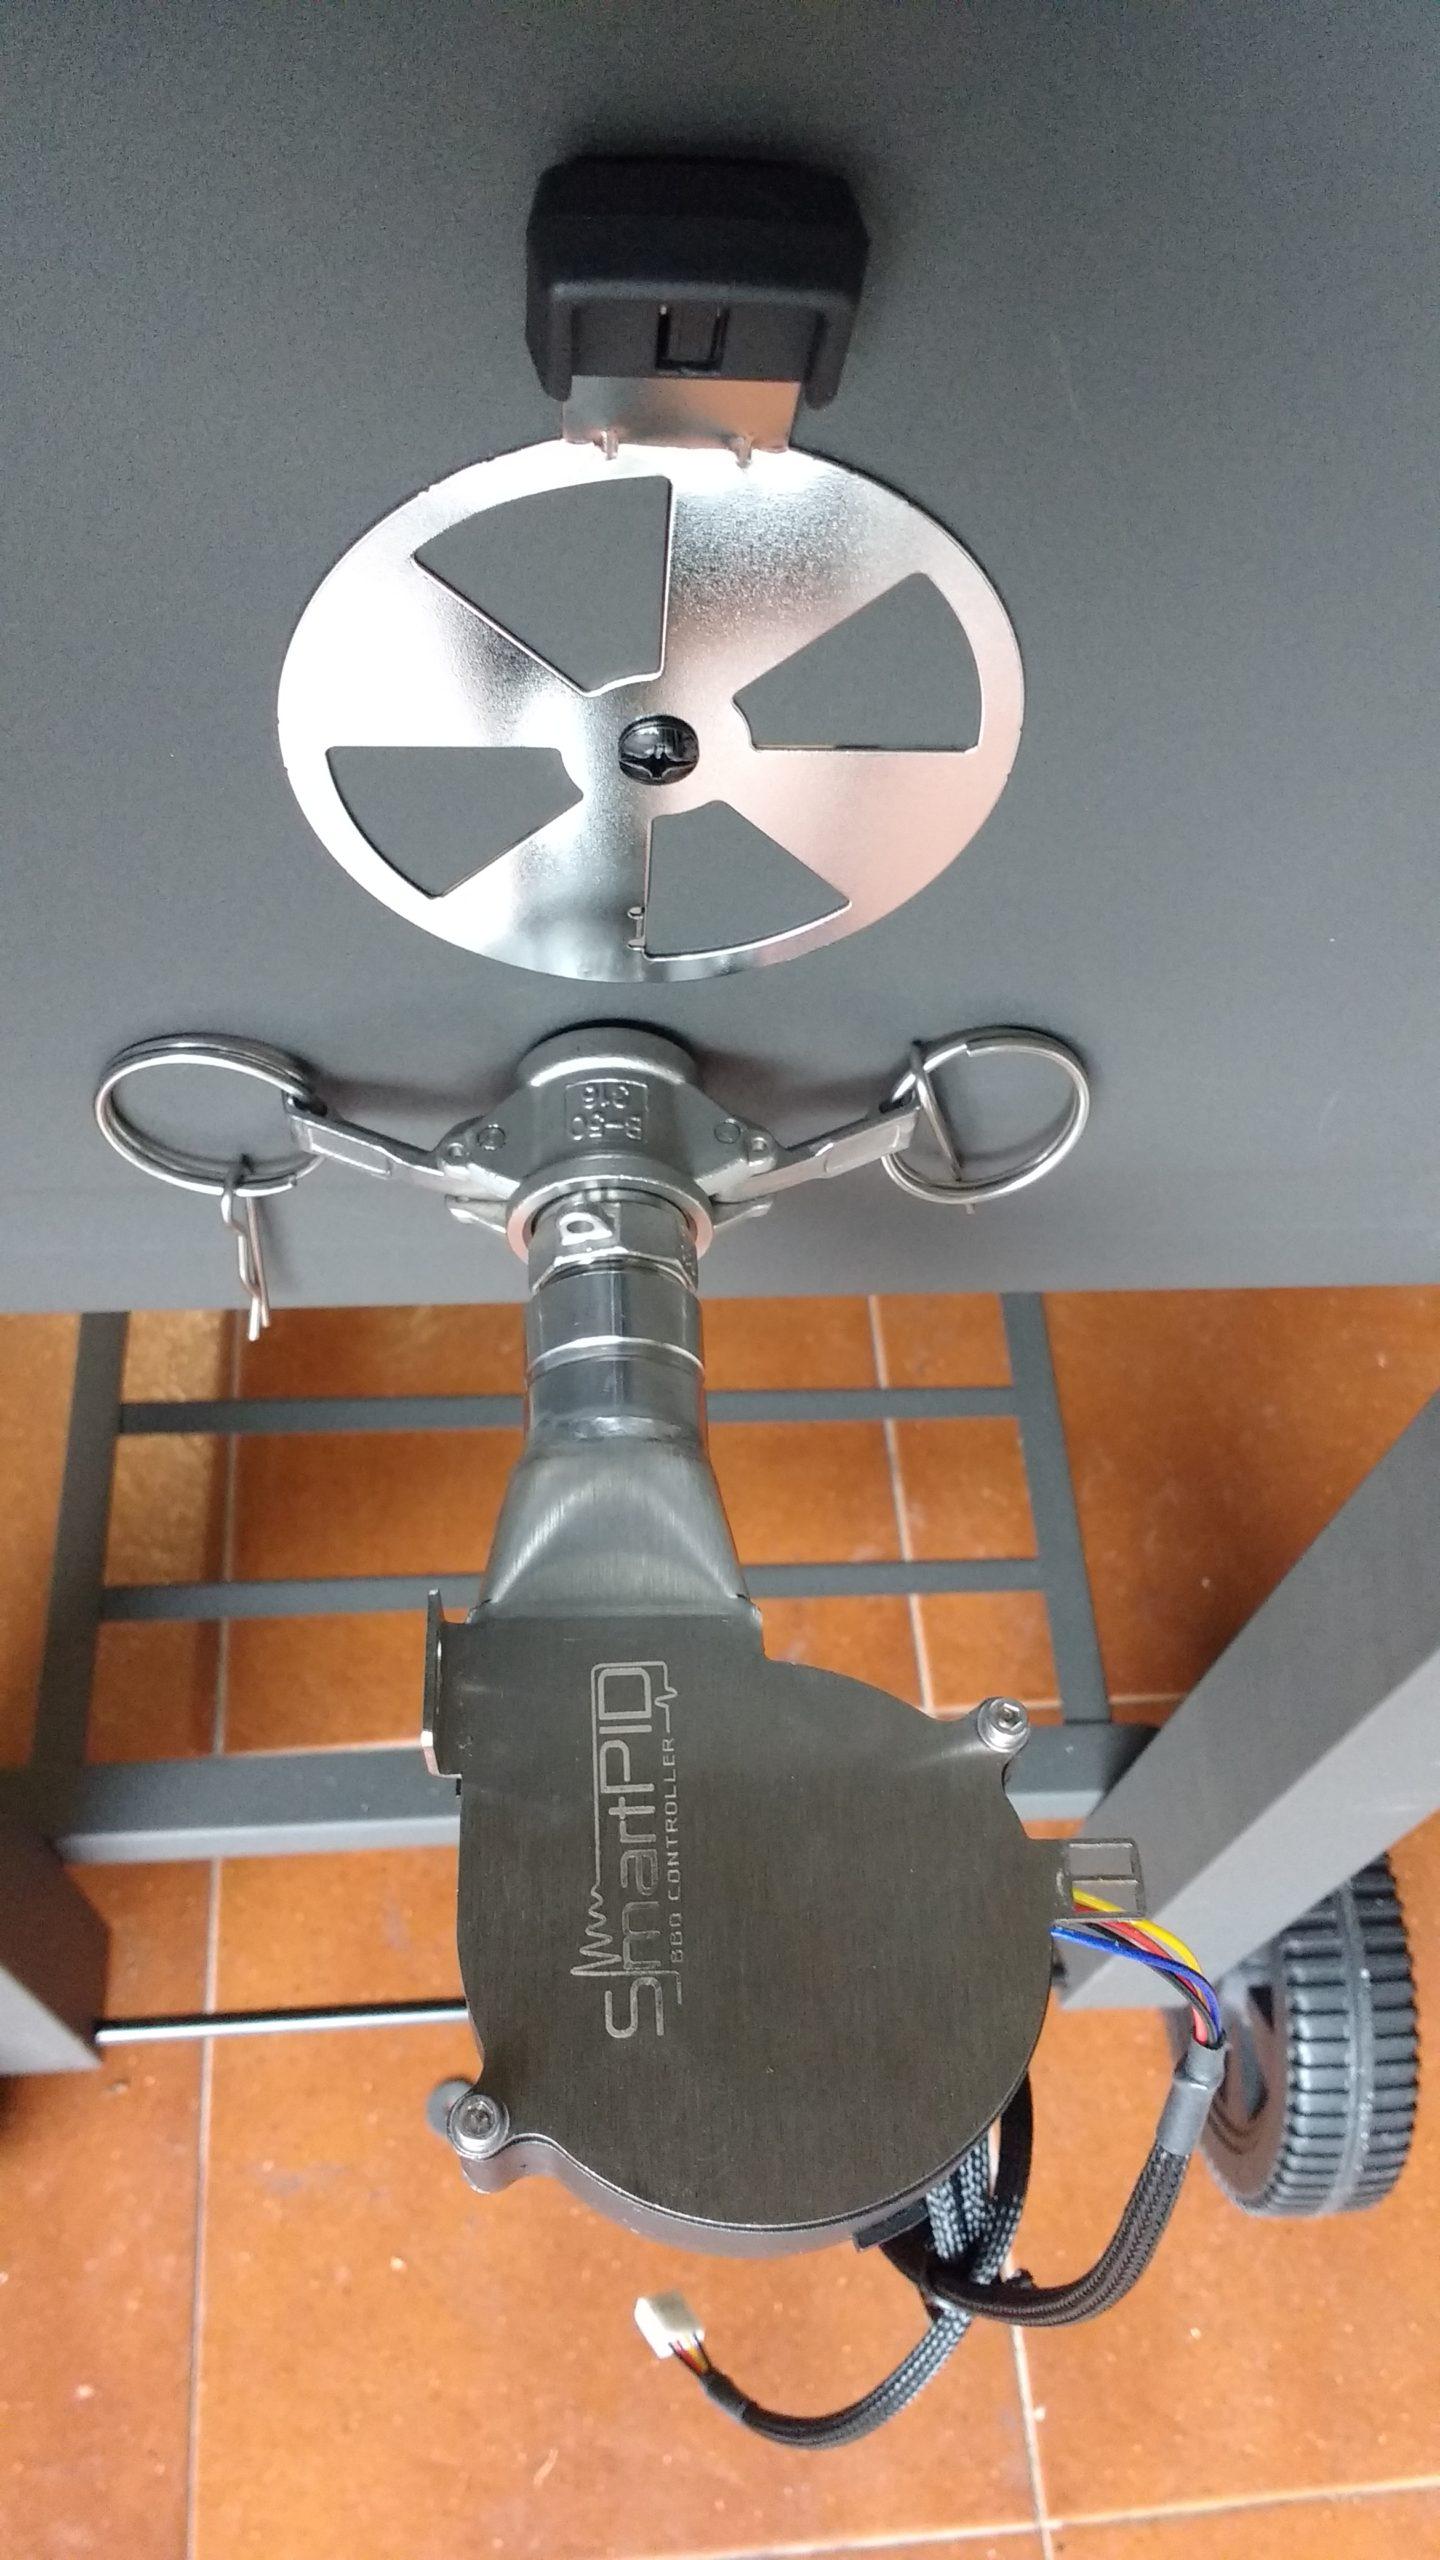 smartpid bbq EASY PRO temperature controller toronto tepro